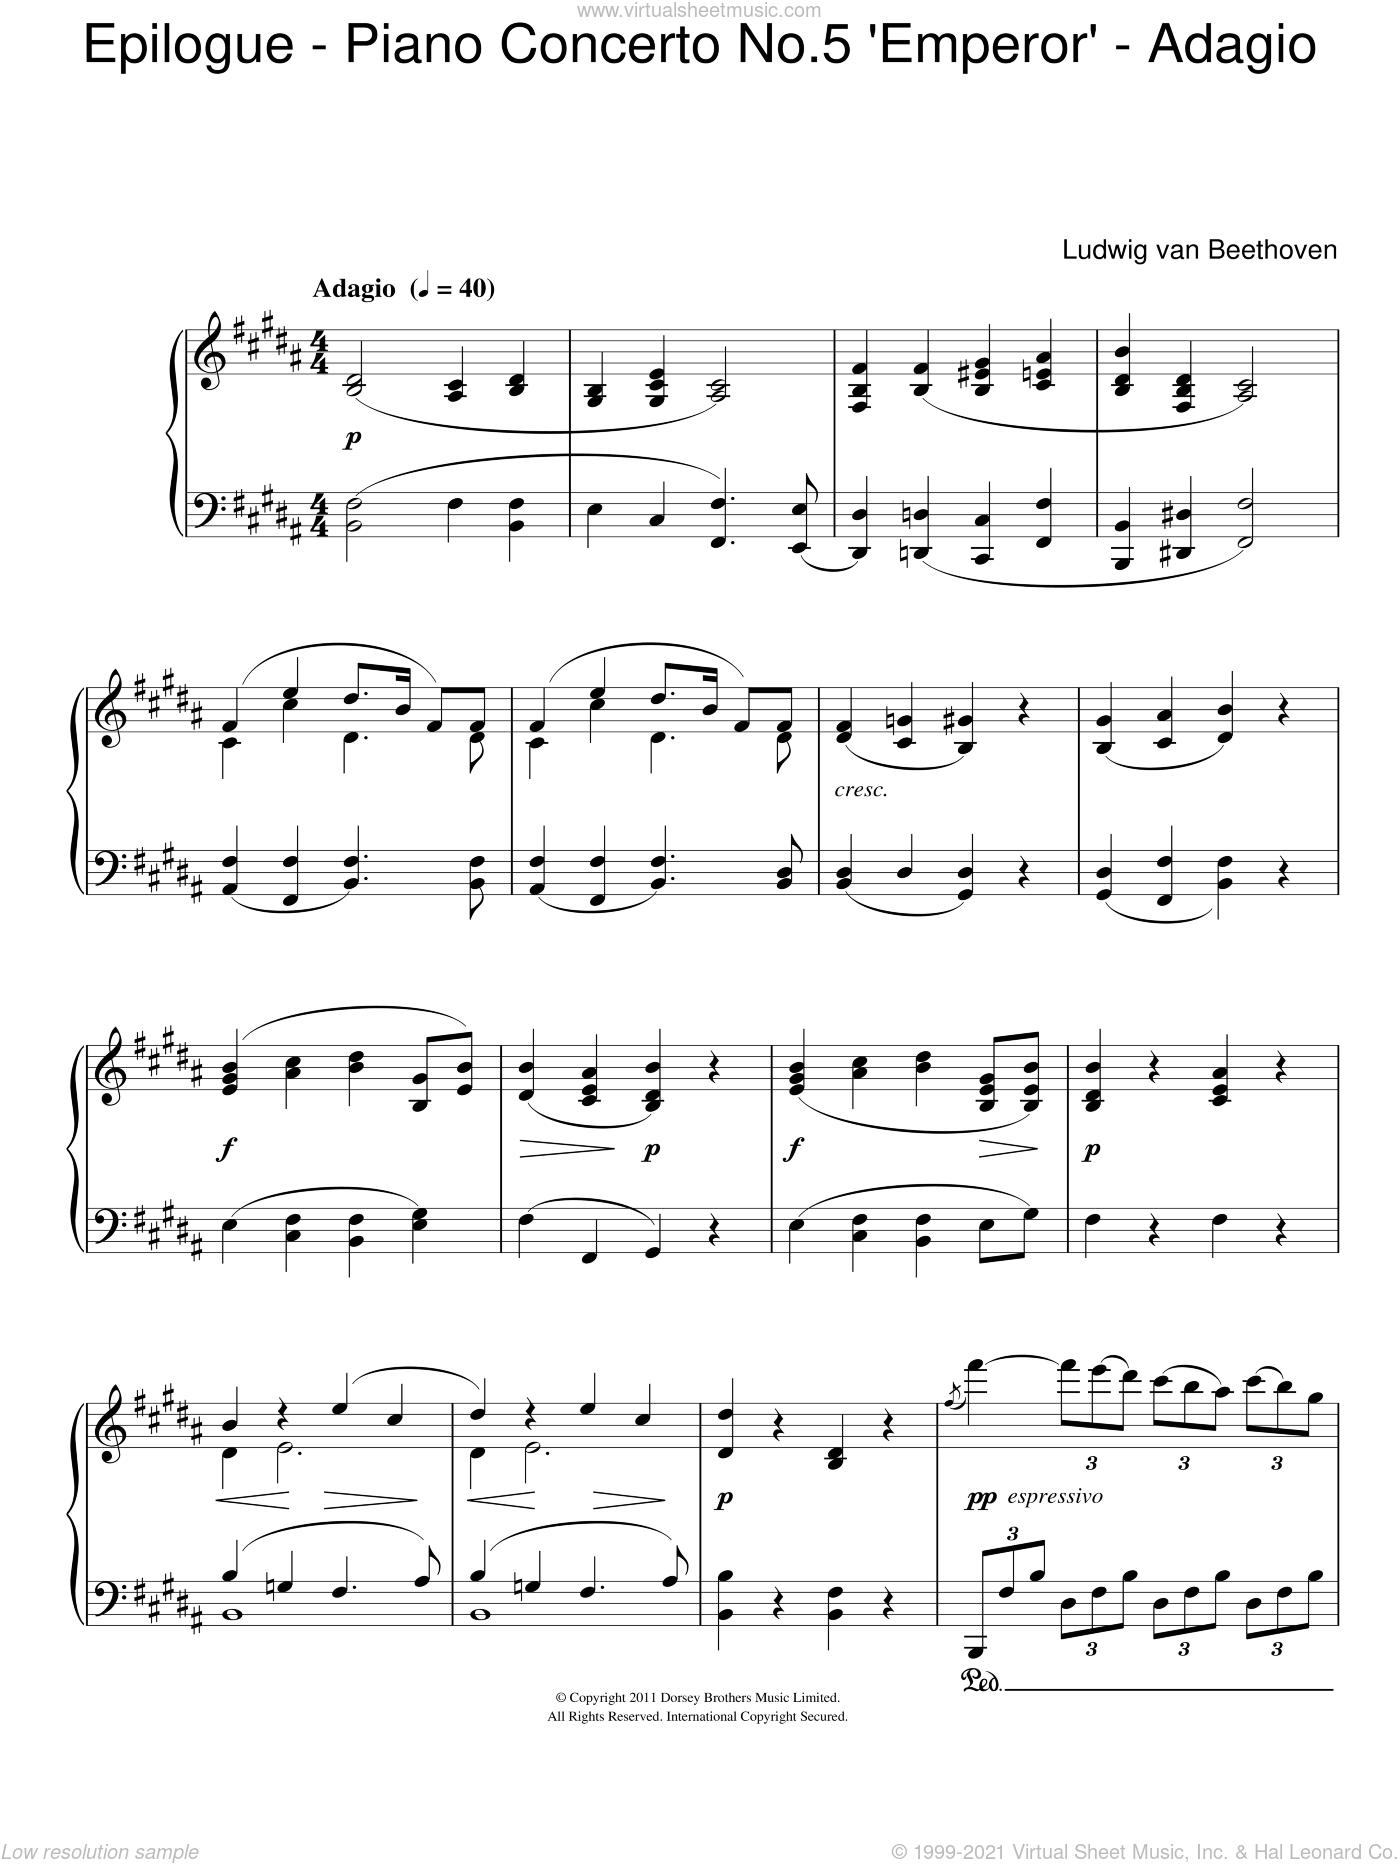 Epilogue (Piano Concerto No.5 'Emperor' - Adagio) sheet music for piano solo by Ludwig van Beethoven, classical score, intermediate skill level